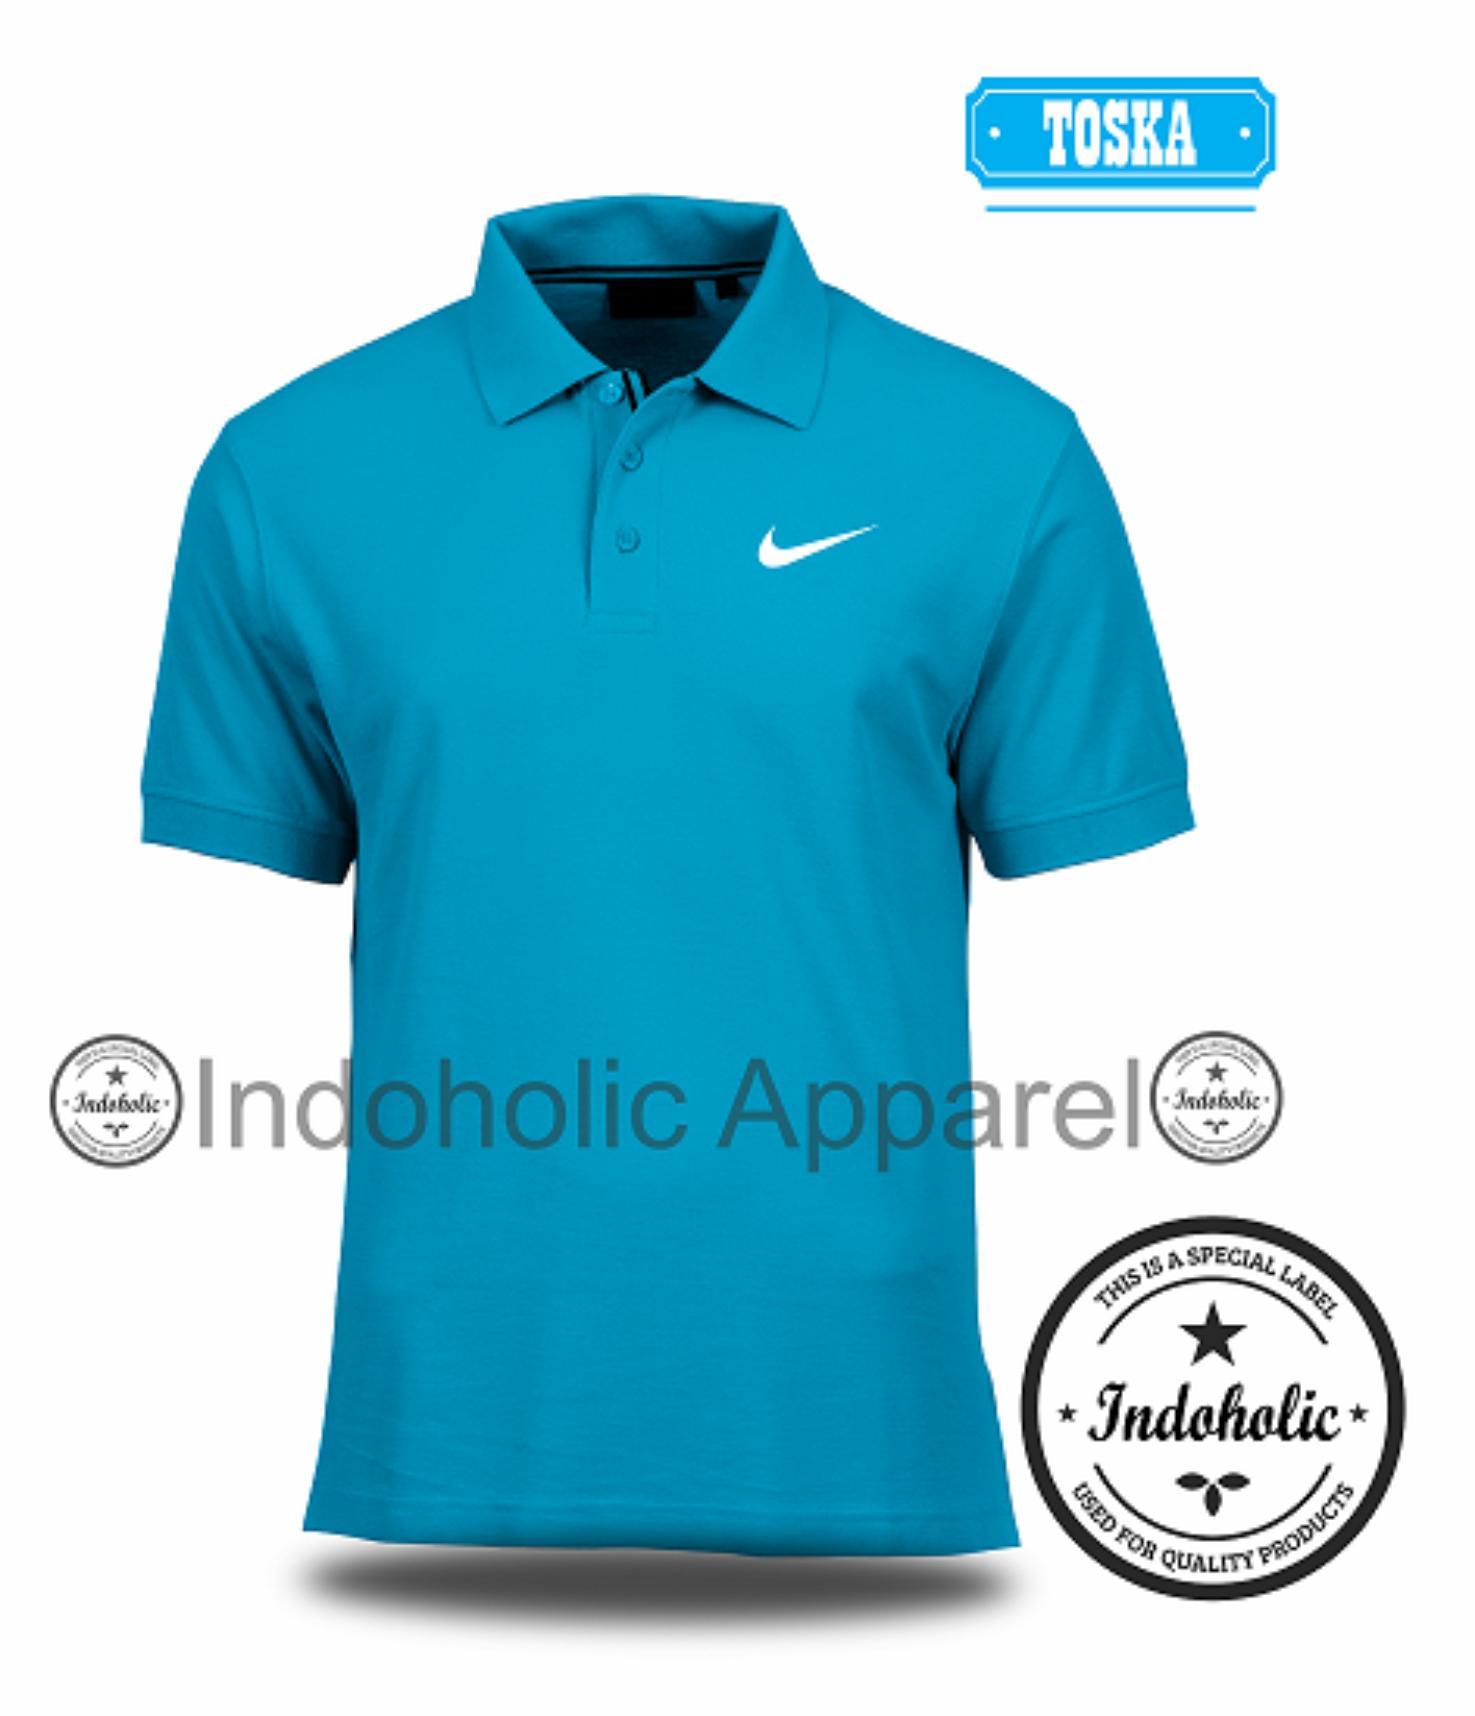 Polo Shirt Kaos Distro Sport Olahraga Jersey Original Nike Branded T-Shirt Fashion Pria Wanita Cowok Cewek Baju T-Shirt Jakarta Bandung Terbaru Jaman Now Kekinian Atasan Pakaian Polos Pendek Kerah Berkera